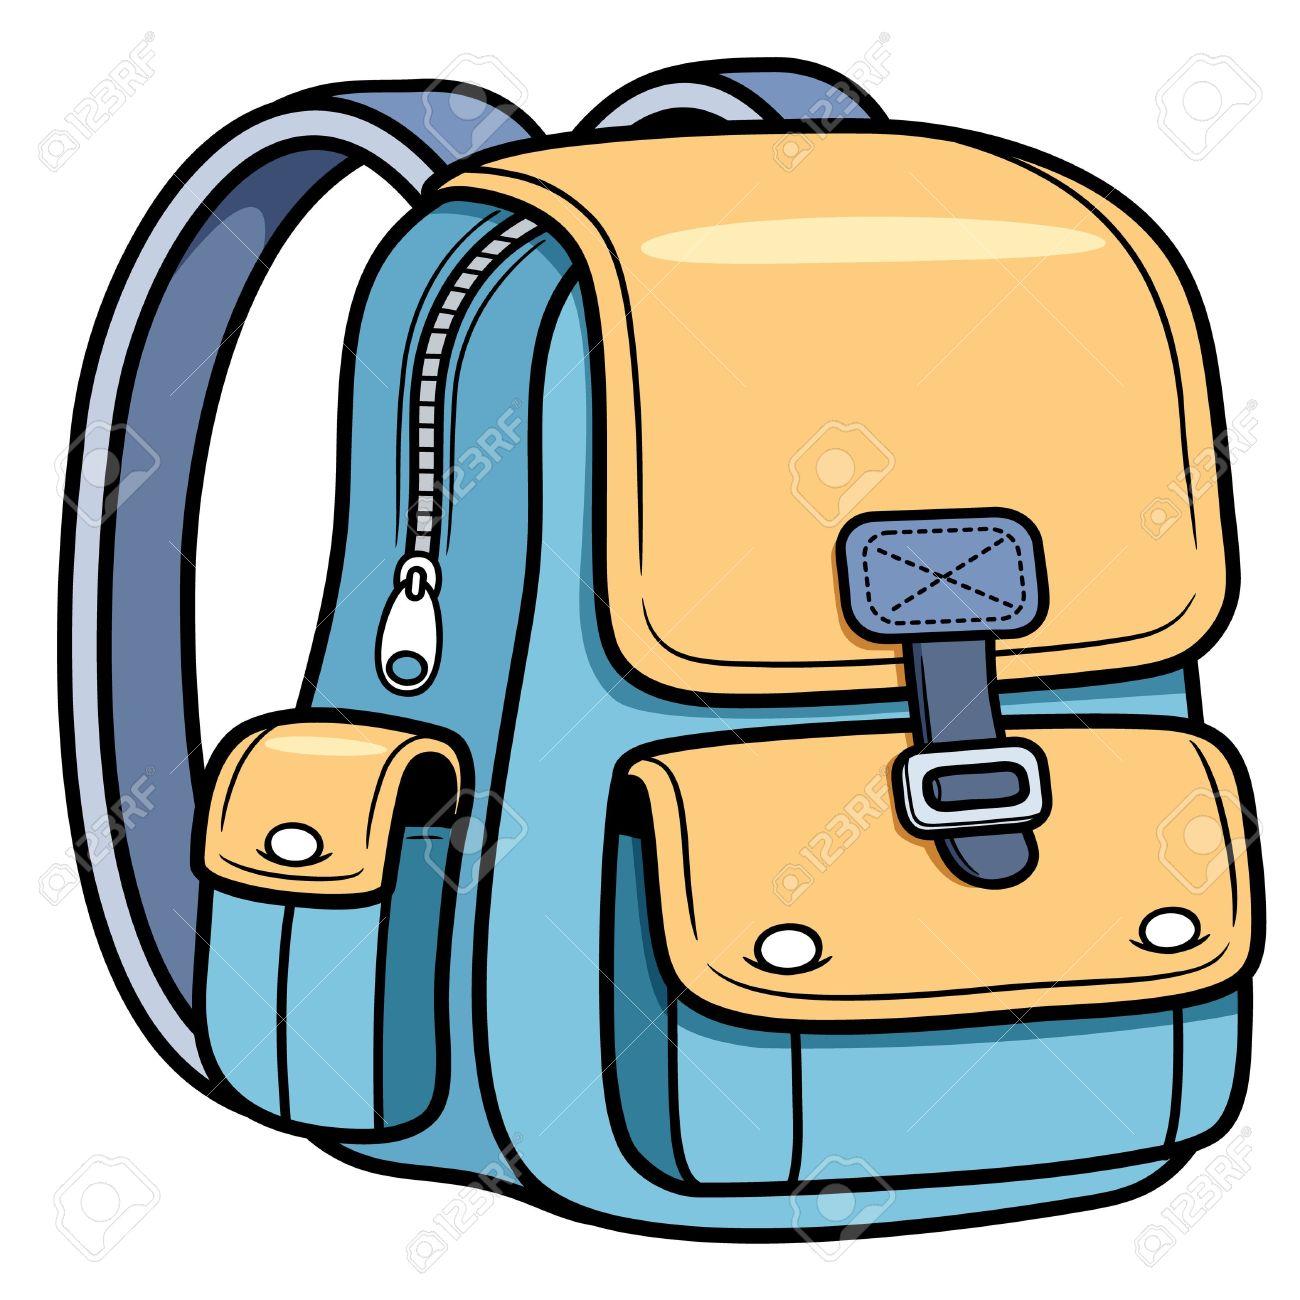 School Bags Drawing at GetDrawings.com.